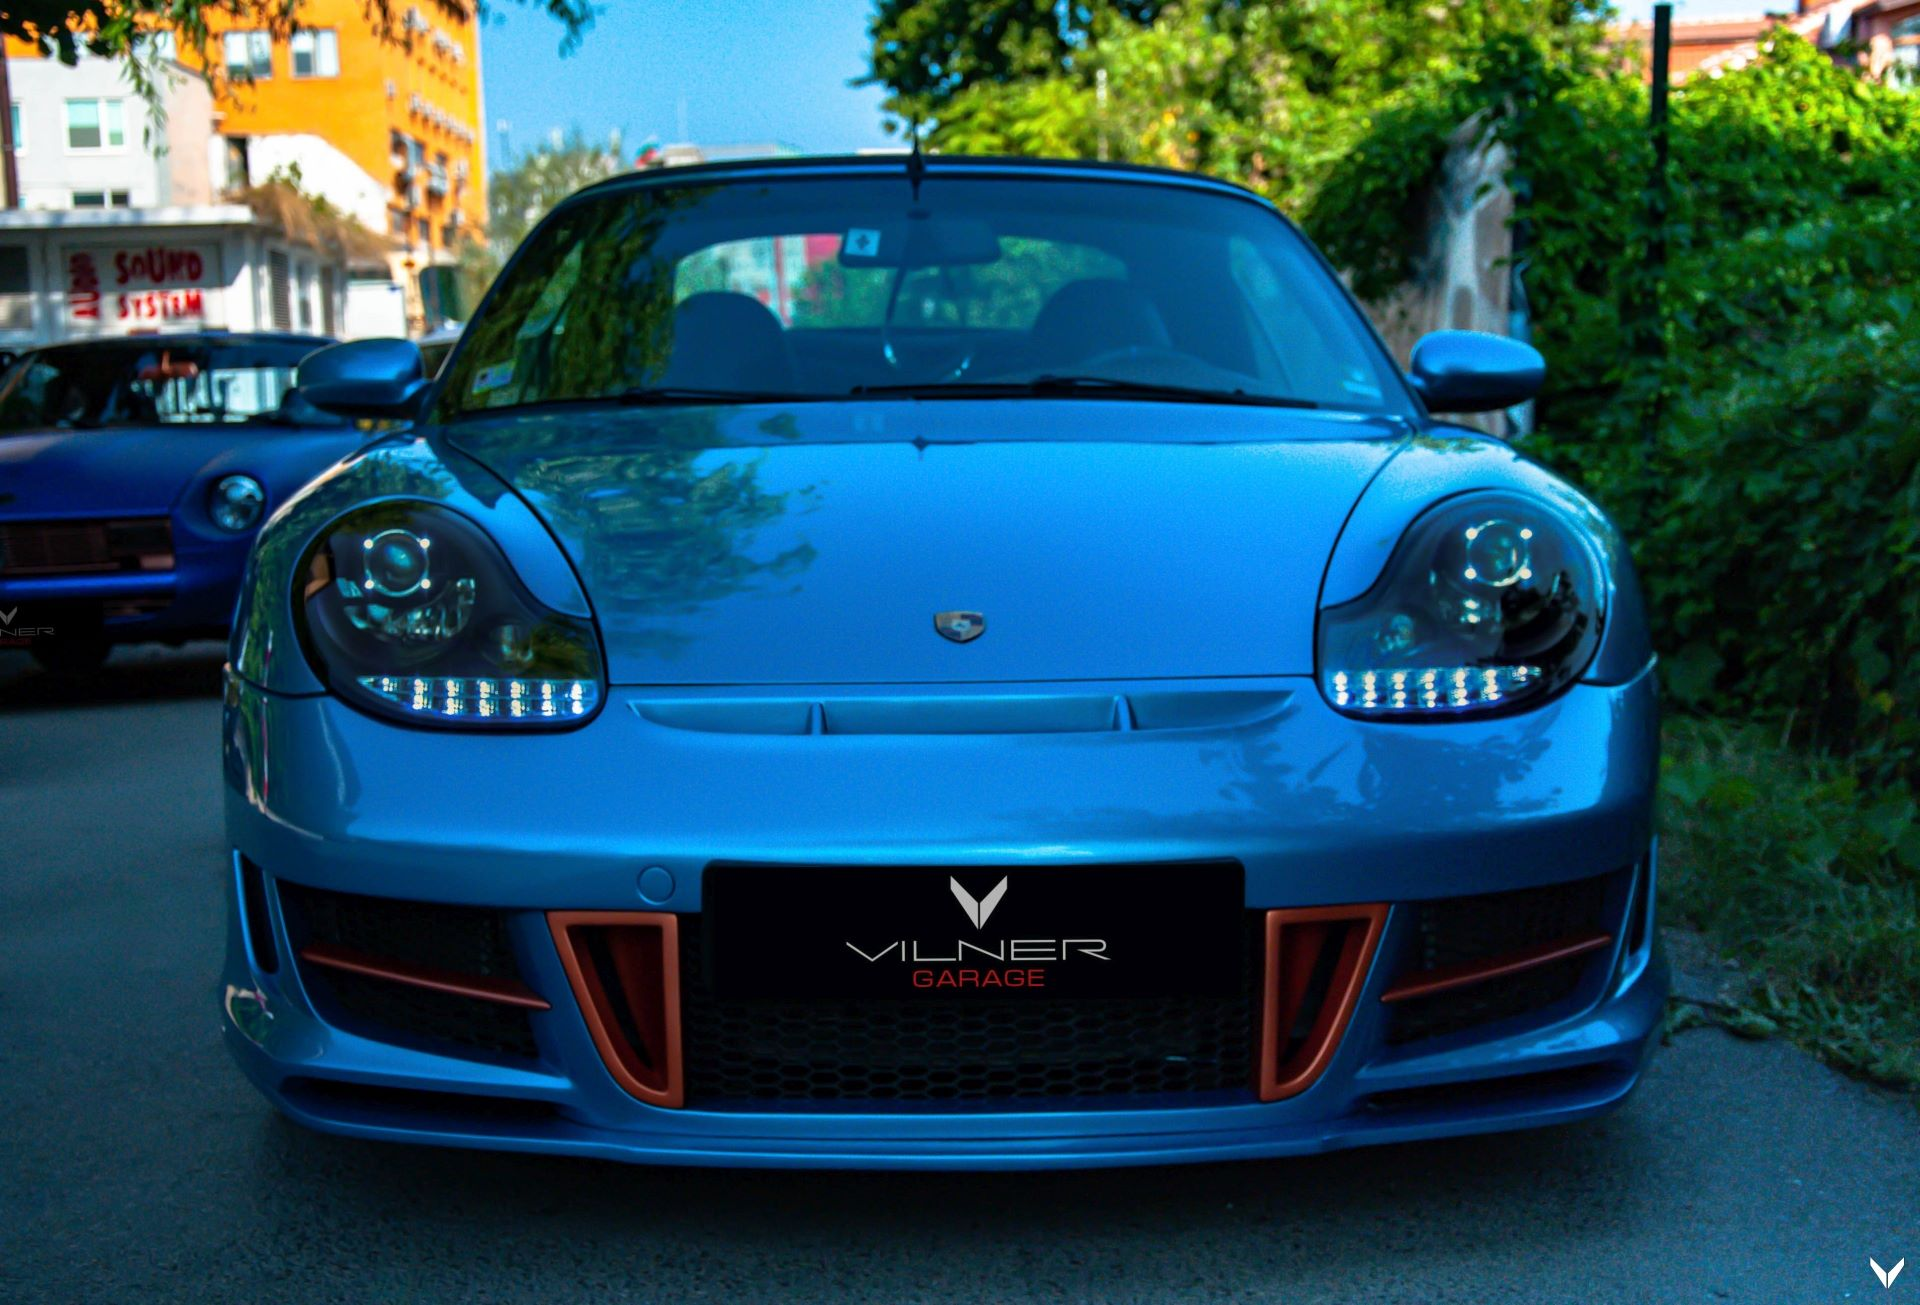 Porsche-911-Cabriolet-by-Vilner-38